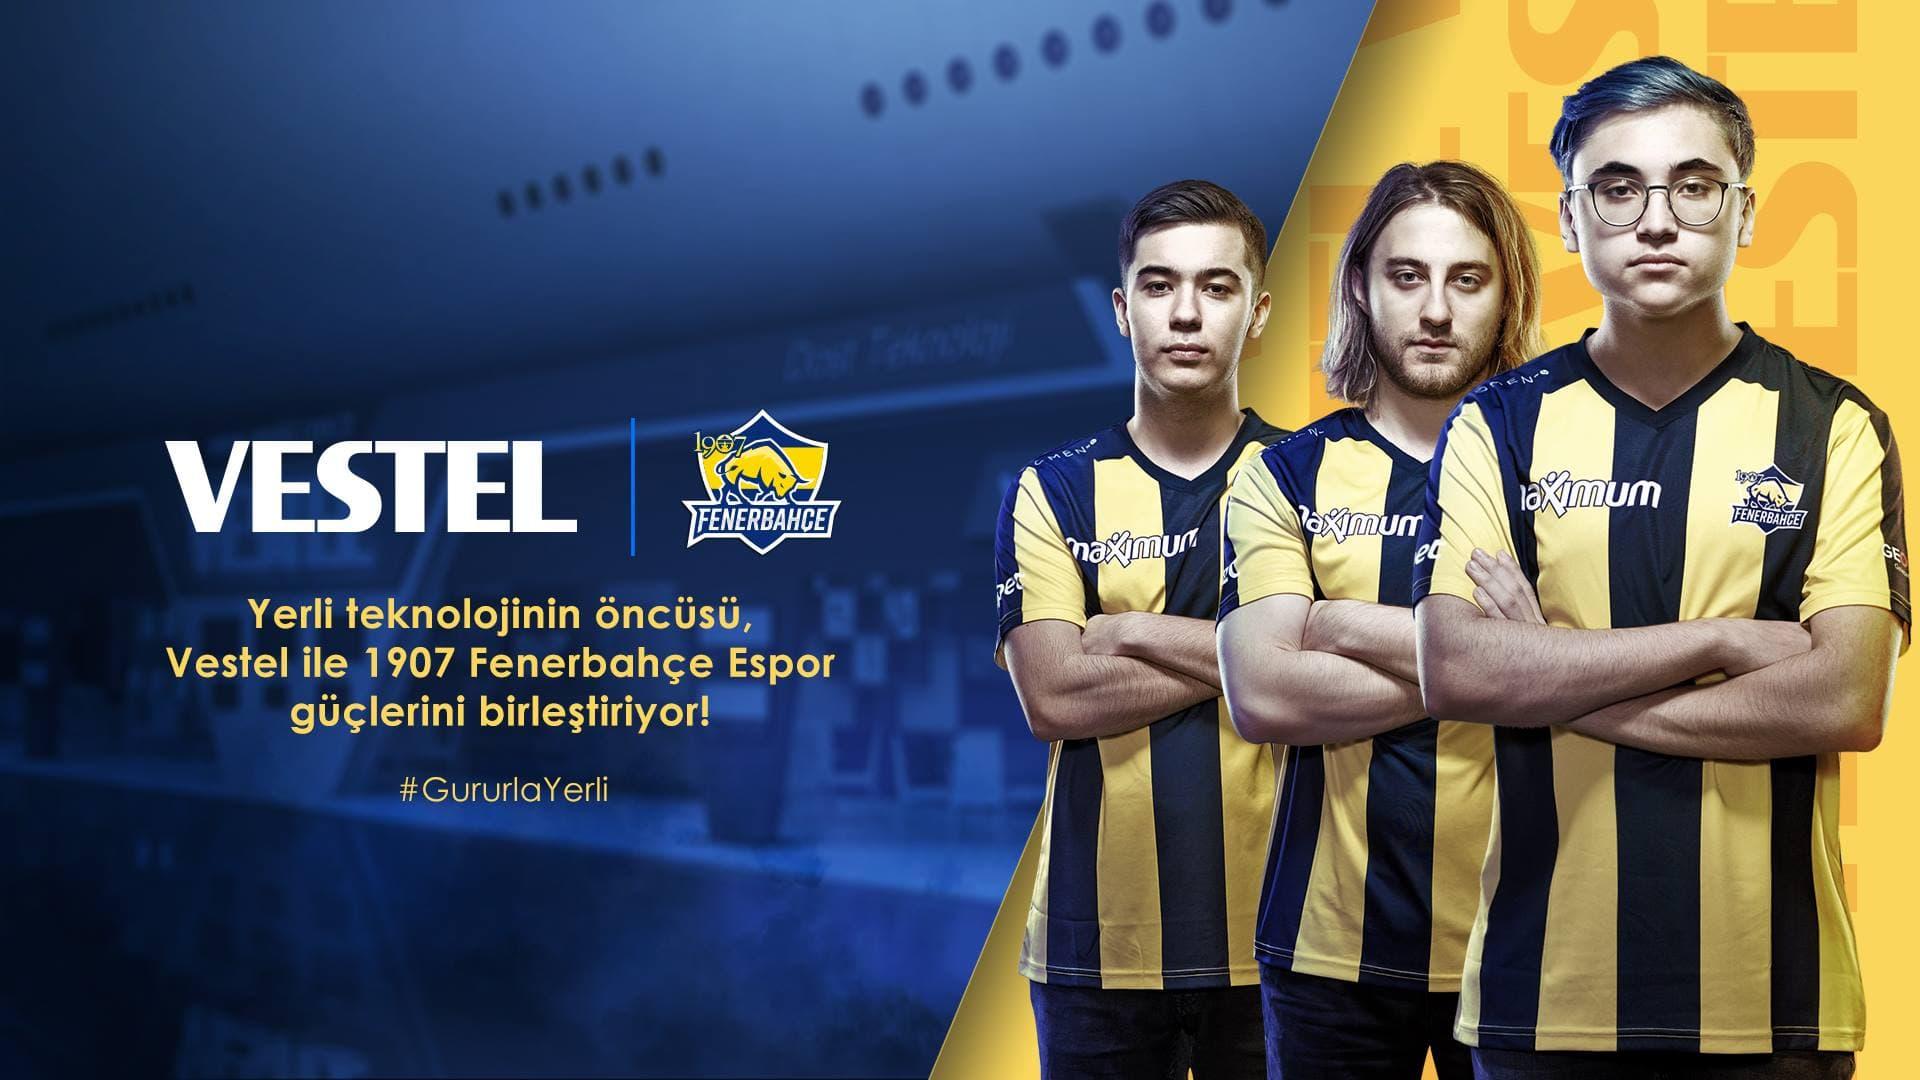 Vestel, 1907 Fenerbahçe Espor Takımı'na Sponsor Oldu